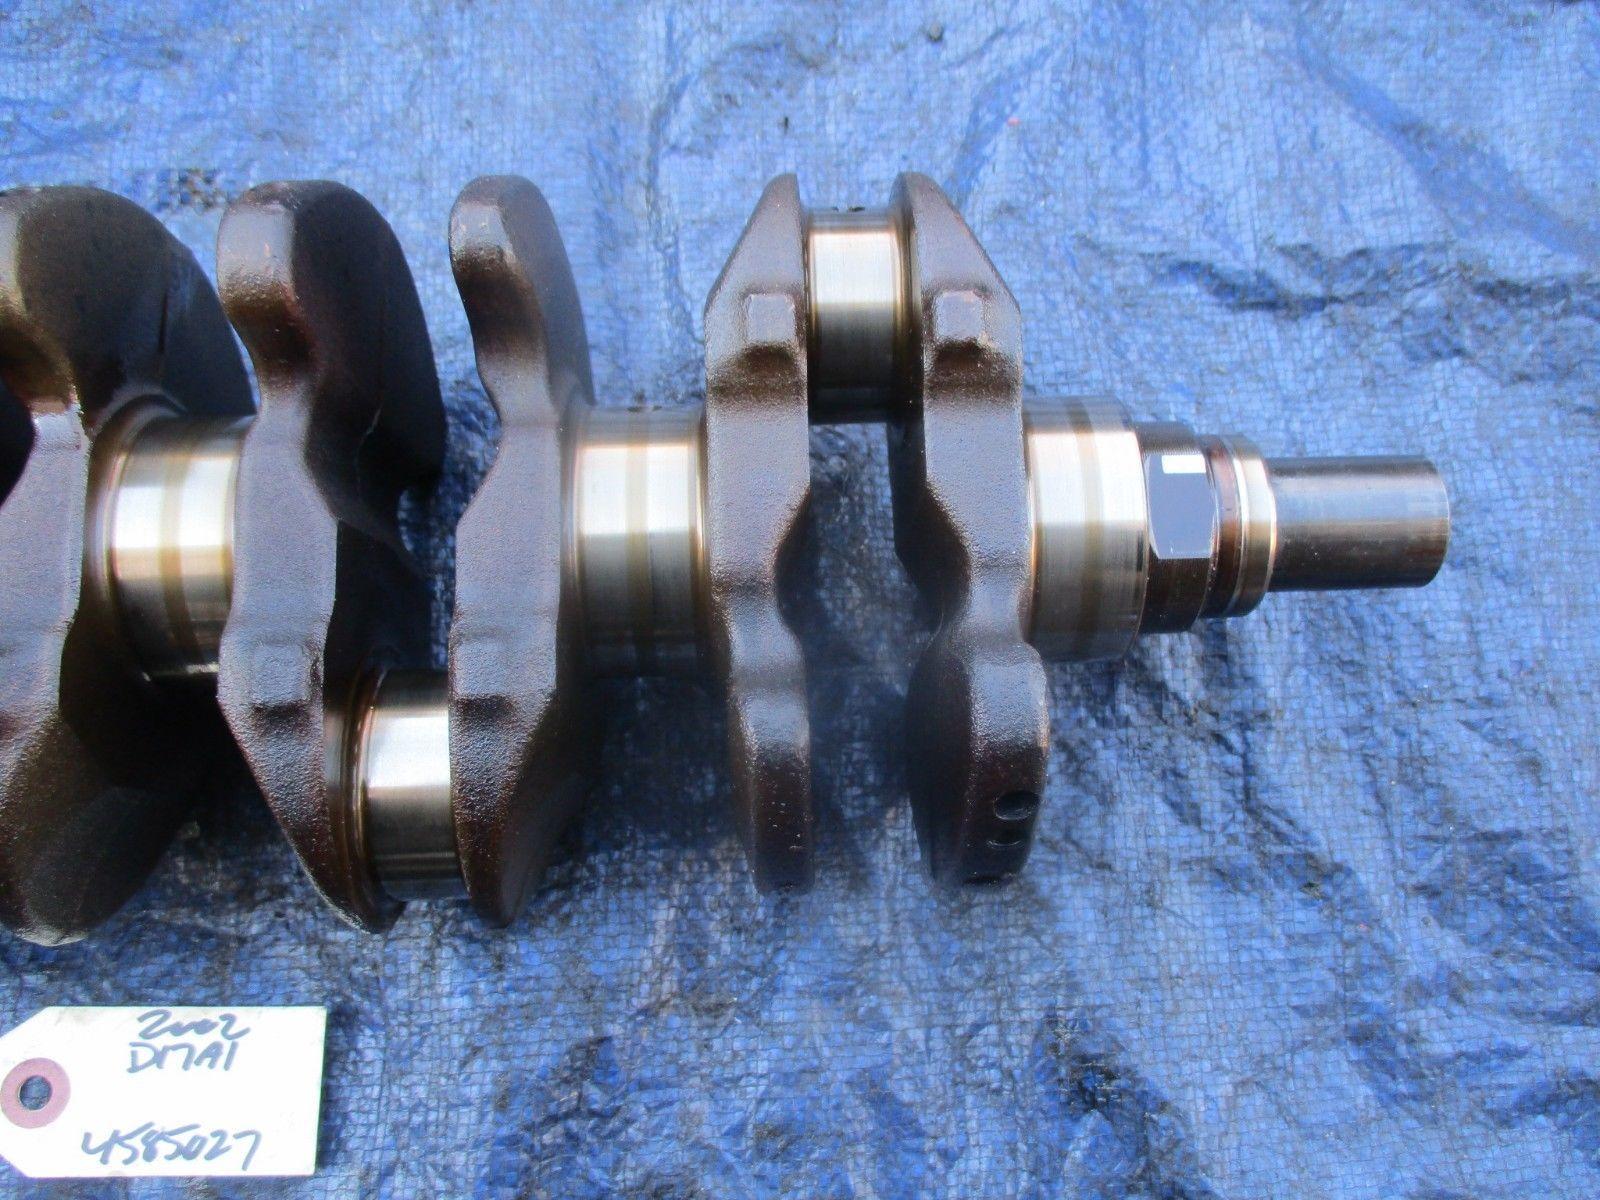 01-05 Honda Civic D17A1 engine crankshaft assembly engine motor D17 OEM crank